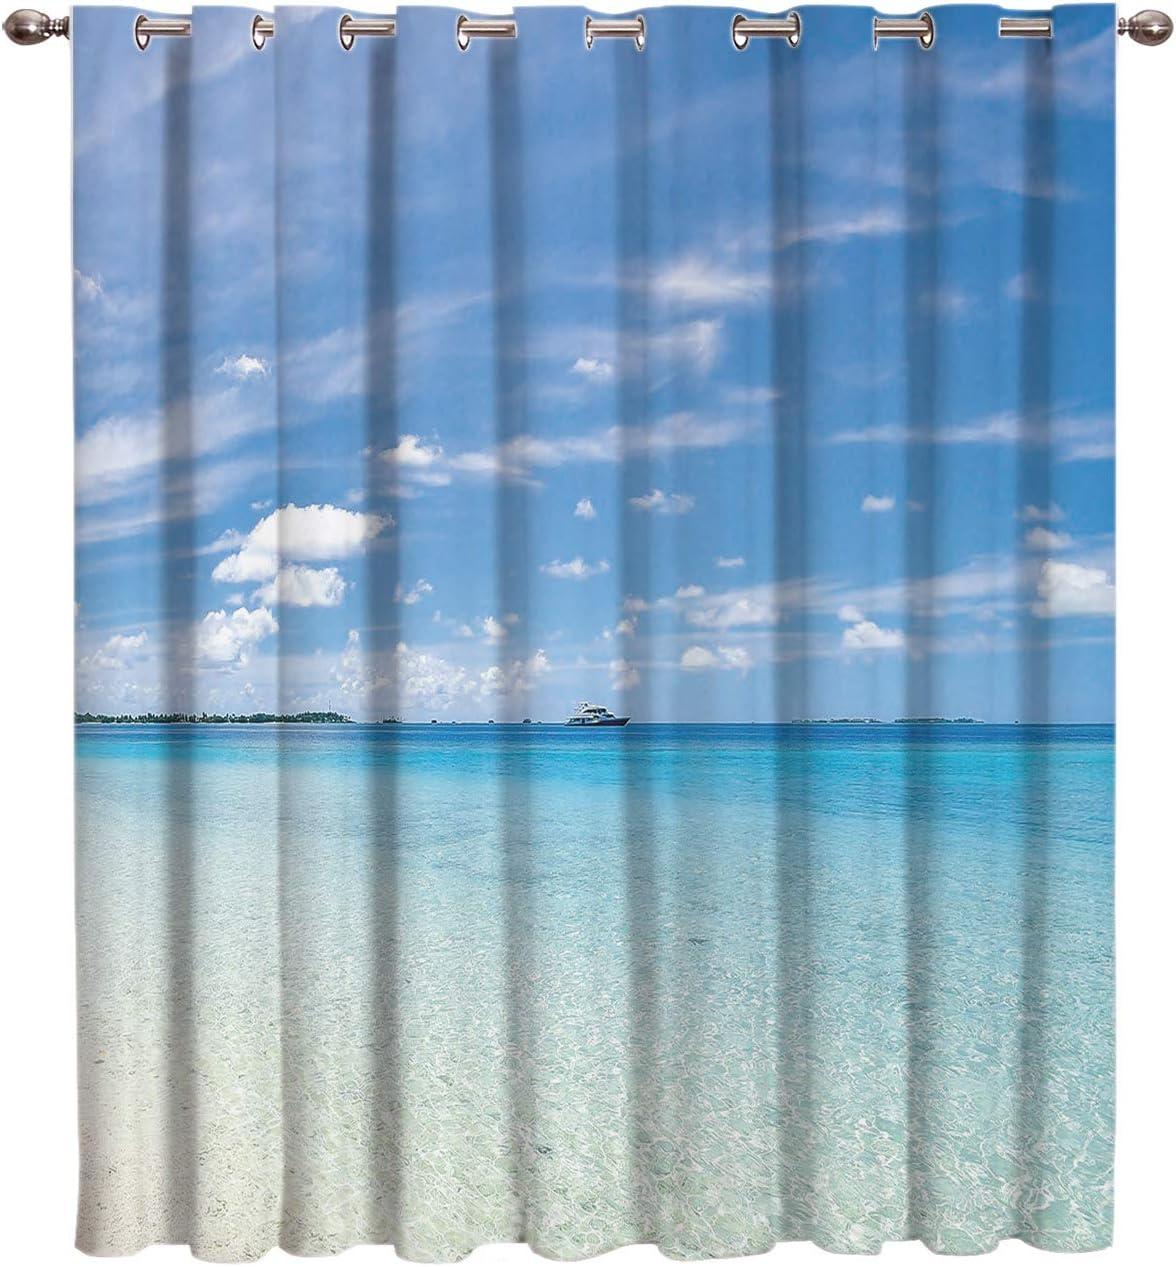 Cloud Dream Home Summer Window-Treatmen 100%品質保証! Darkening Beach Blackout 送料無料 一部地域を除く